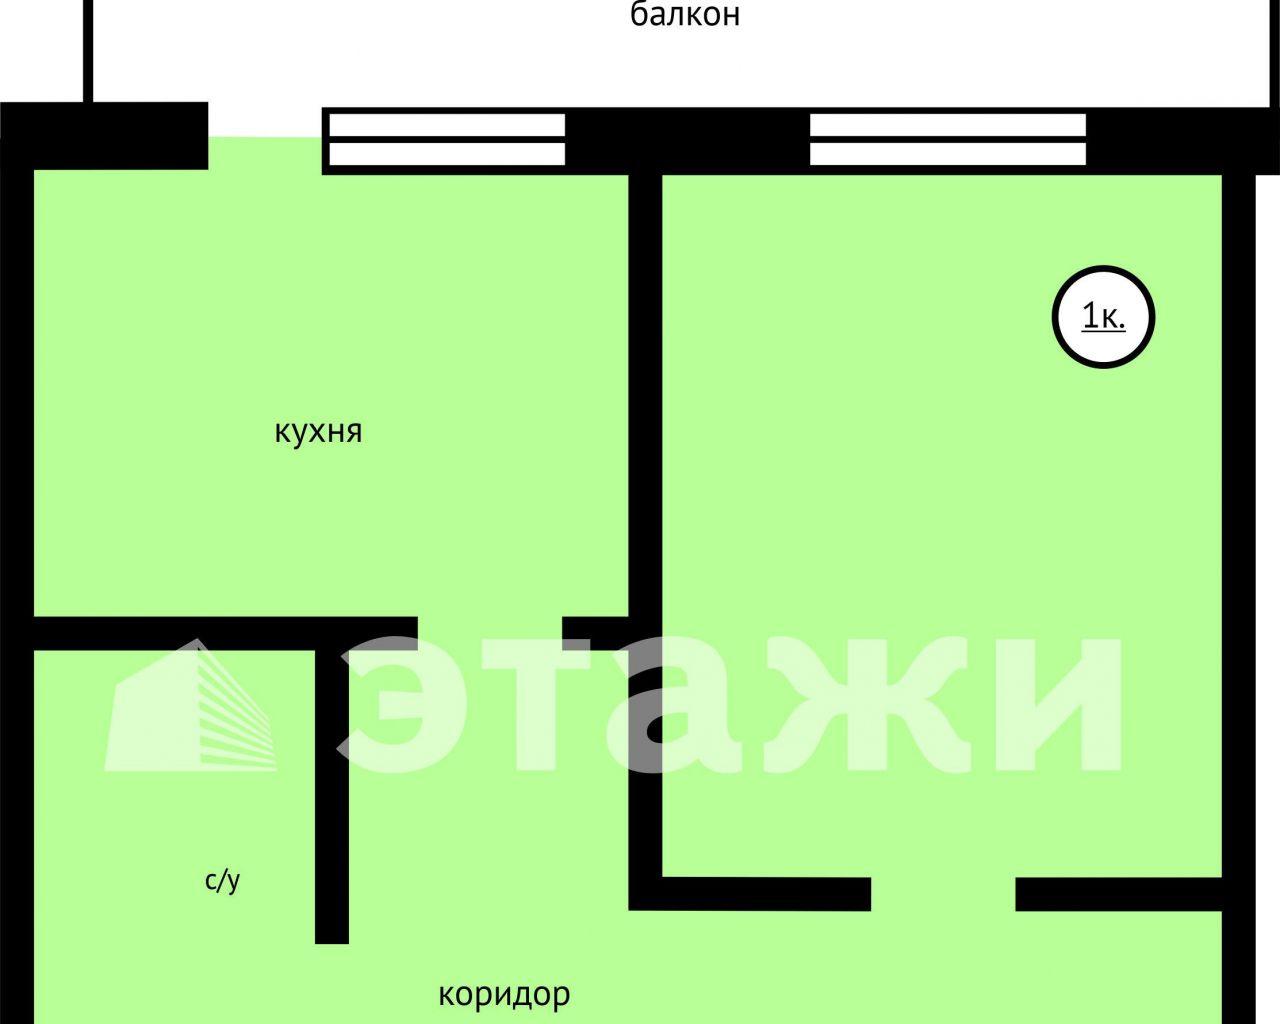 Объявление. г. Тюмень, Комната 12.9кв.м, Котовского, 13. Фото 1